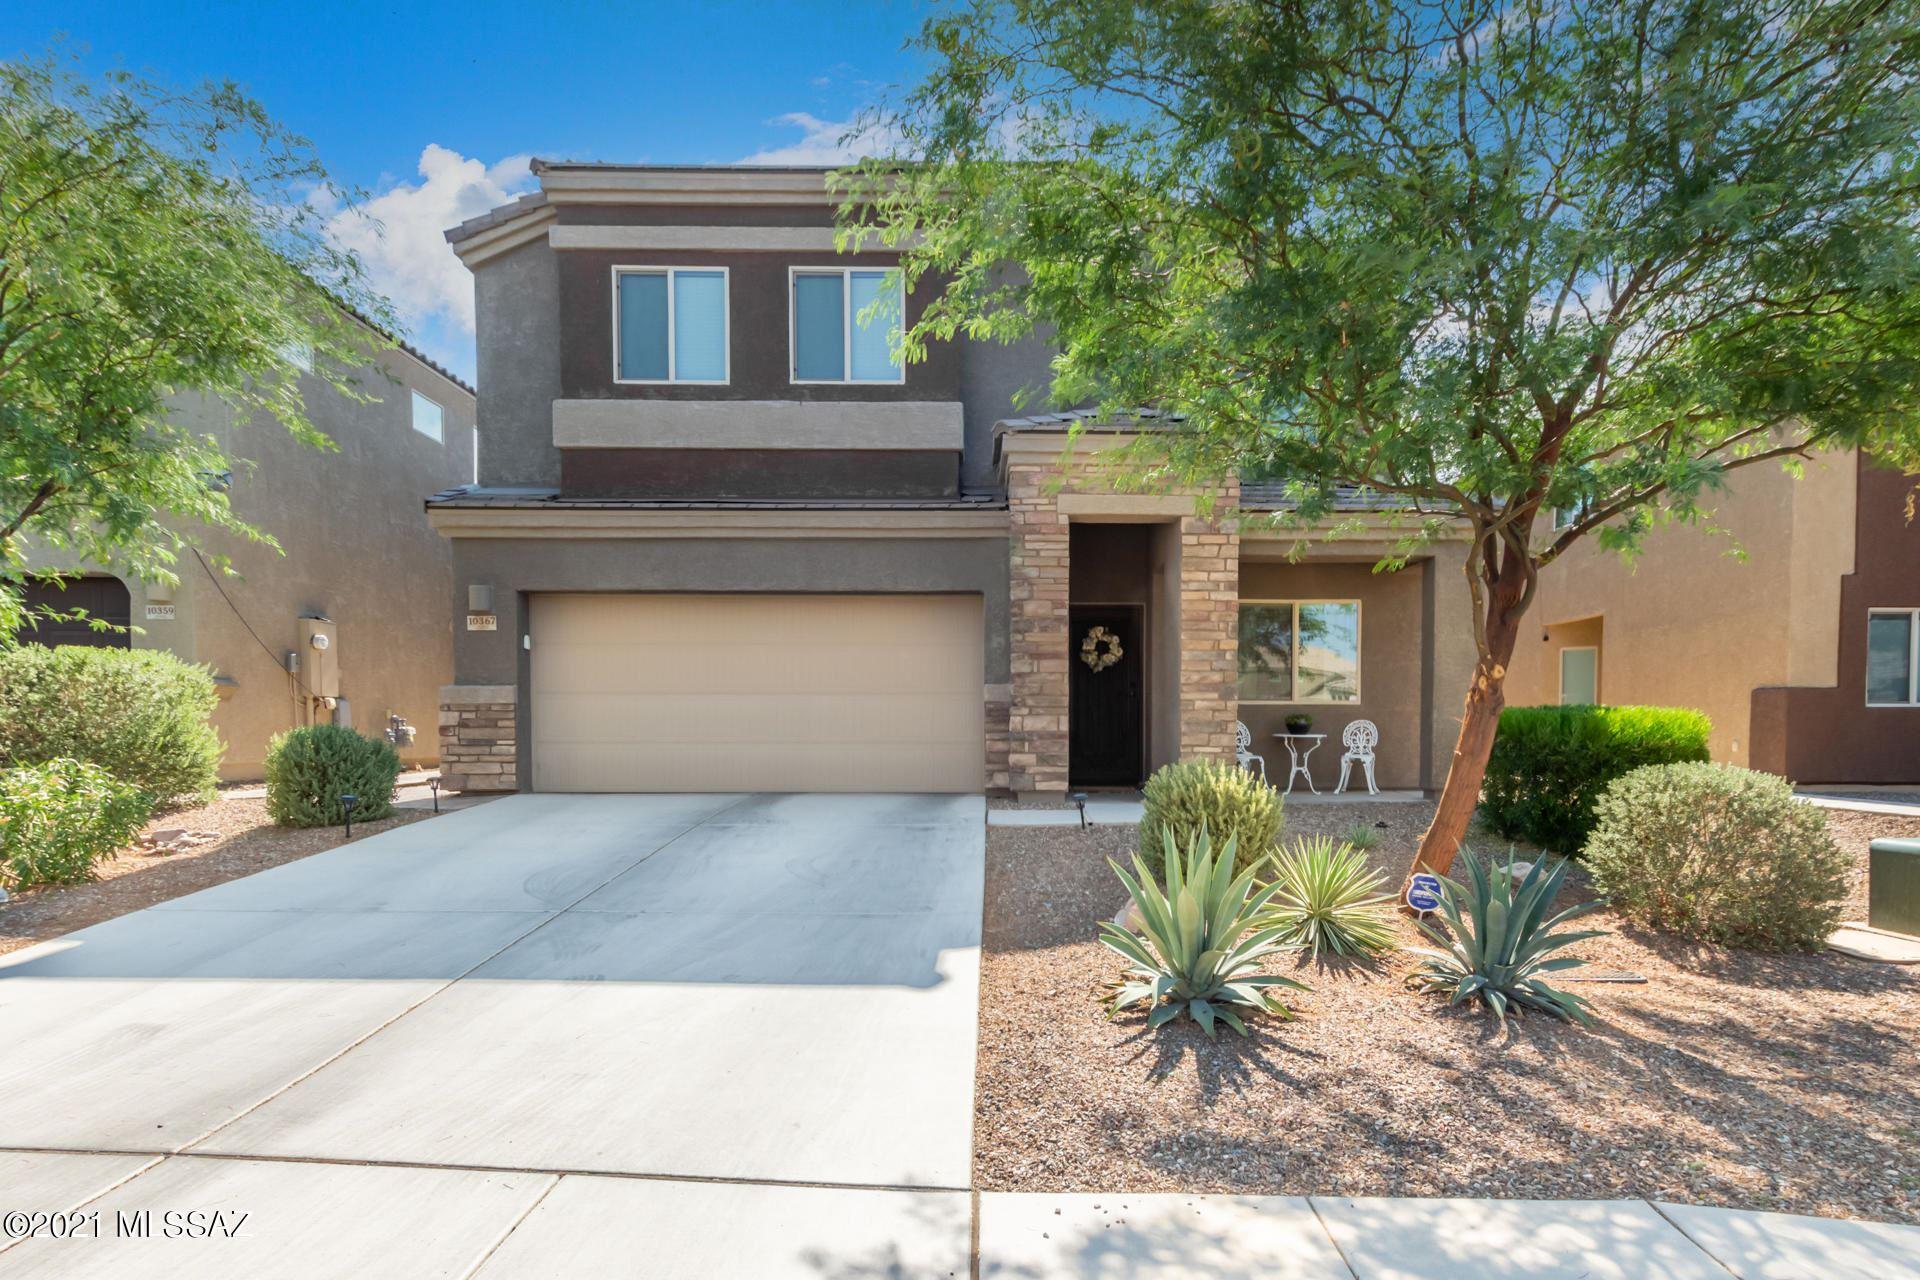 10367 S Keegan Avenue, Vail, AZ 85641 - MLS#: 22118779